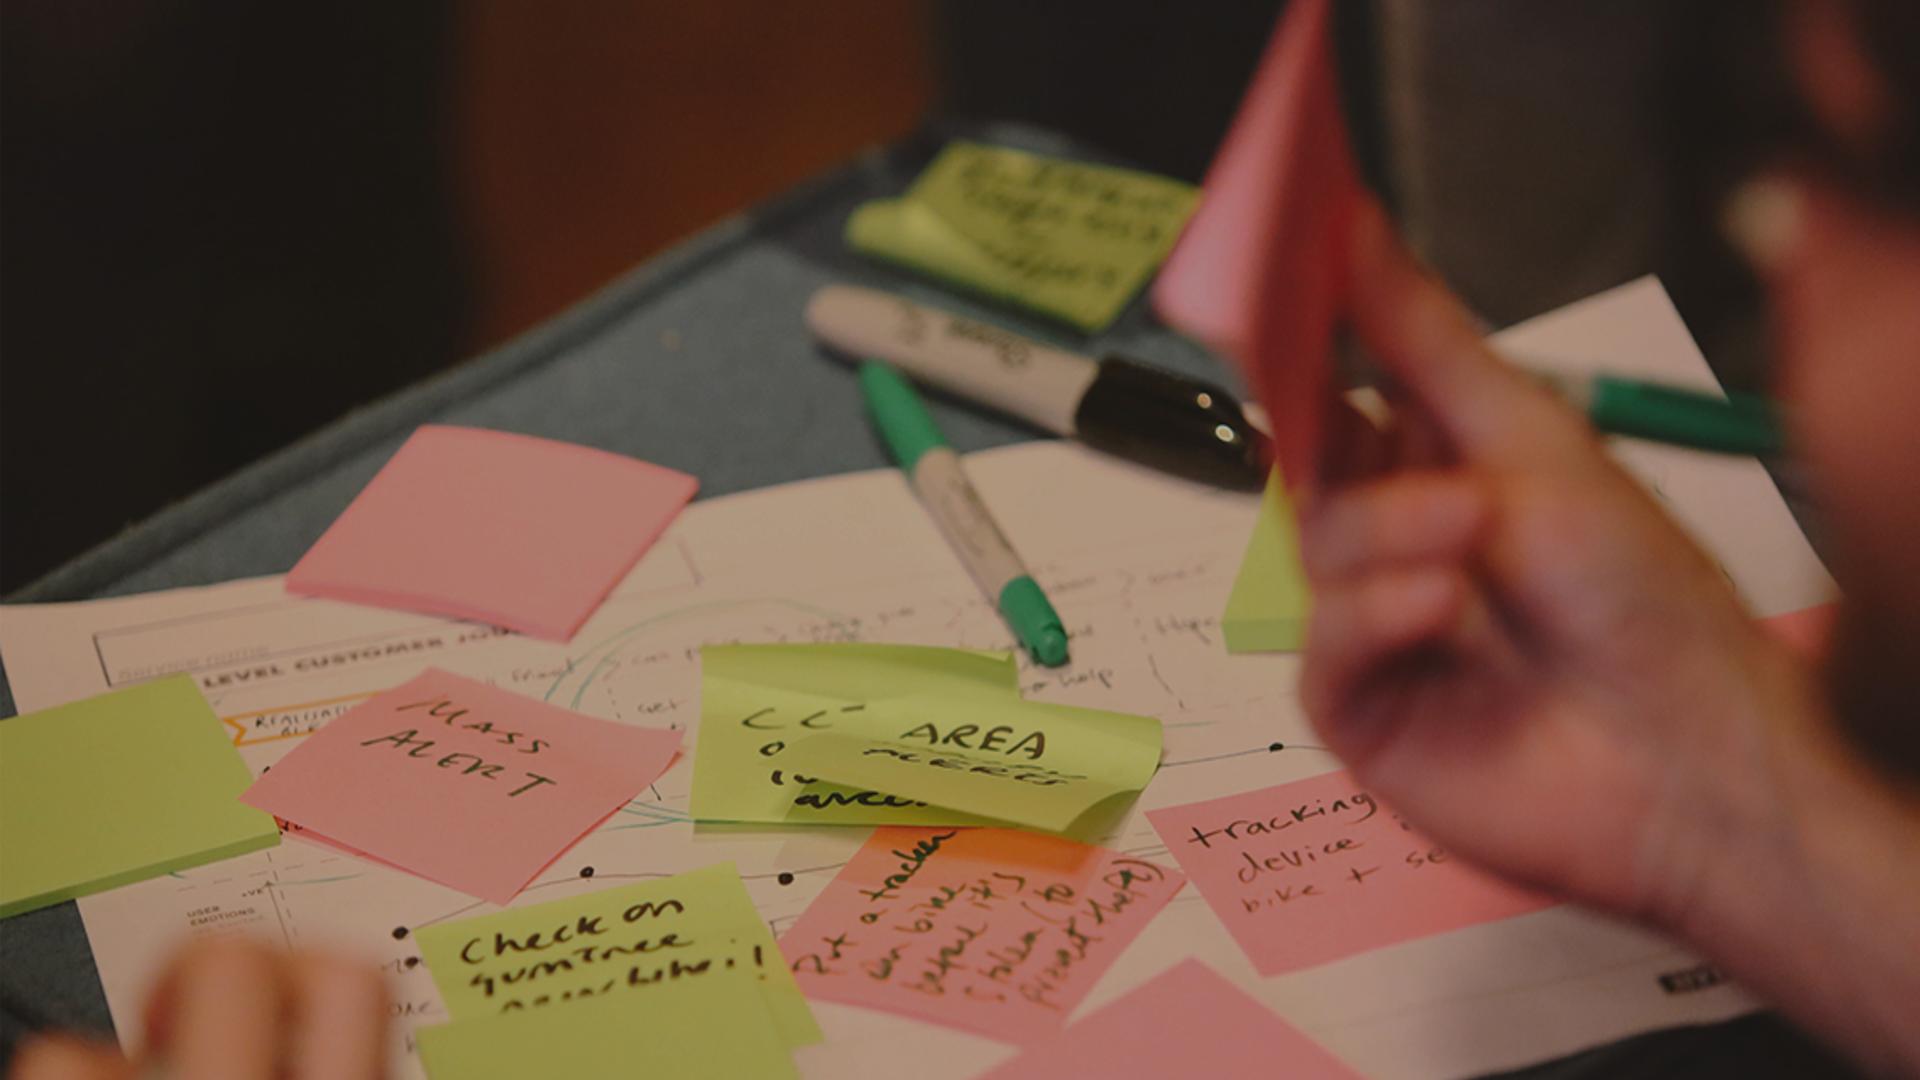 2-Day Innovation Bootcamp